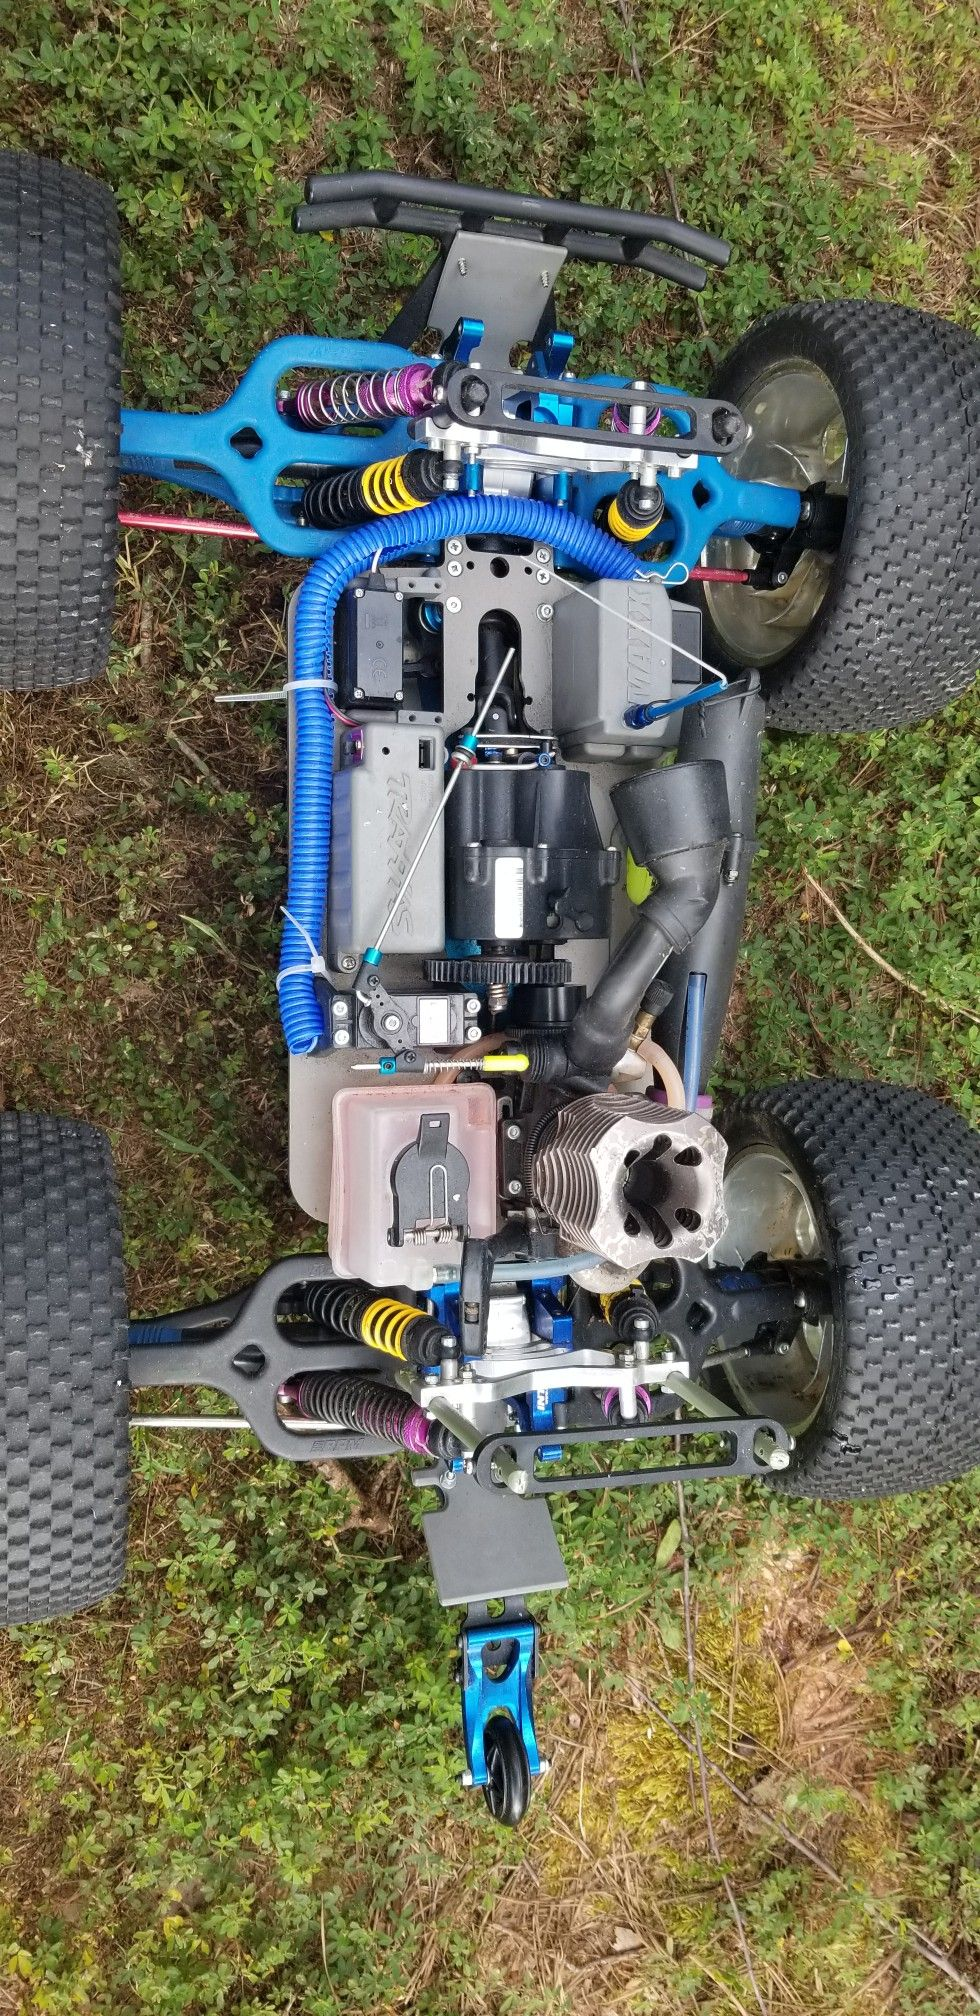 Custom monster maxx build all aluminum riffs metal gear